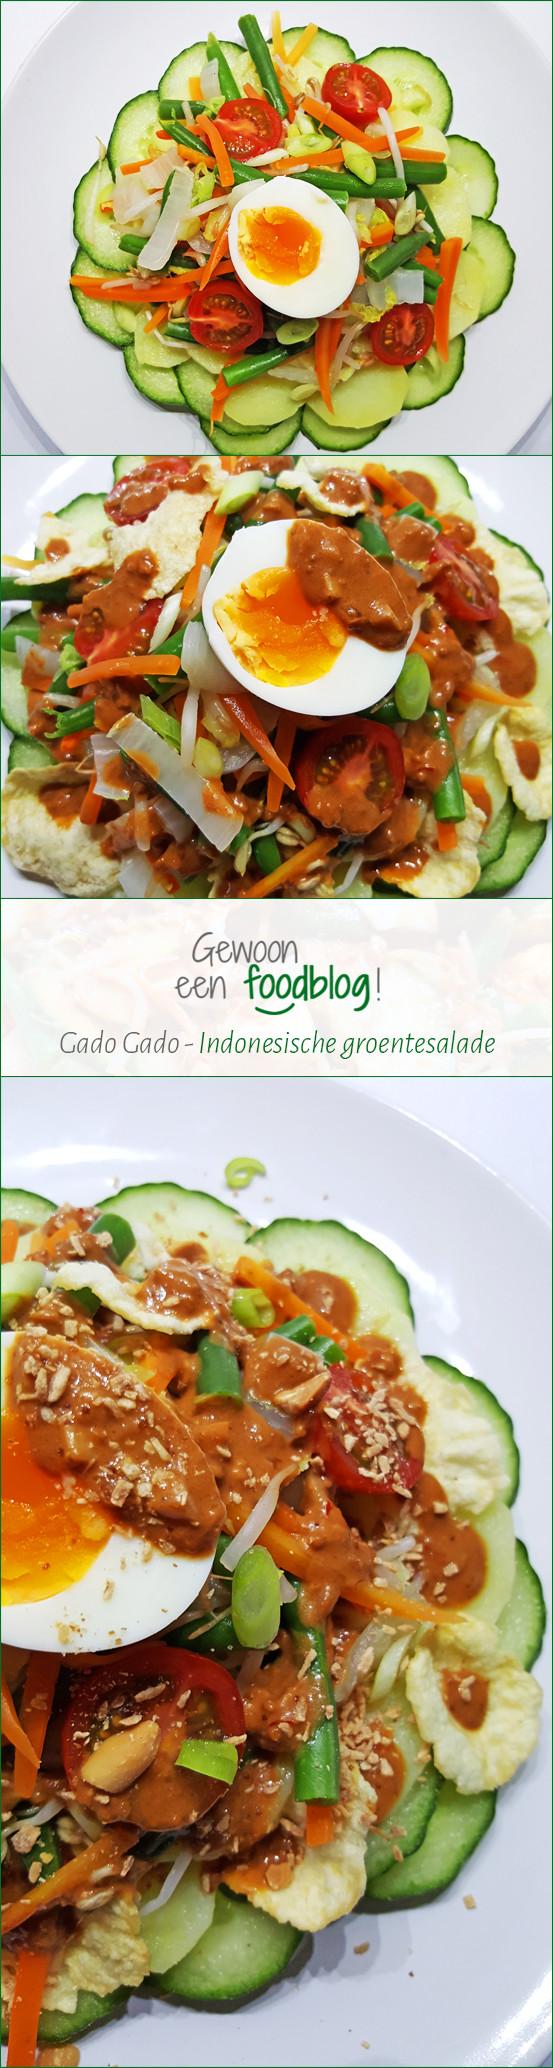 Gado Gado | Indonesische groentesalade met pindasaus